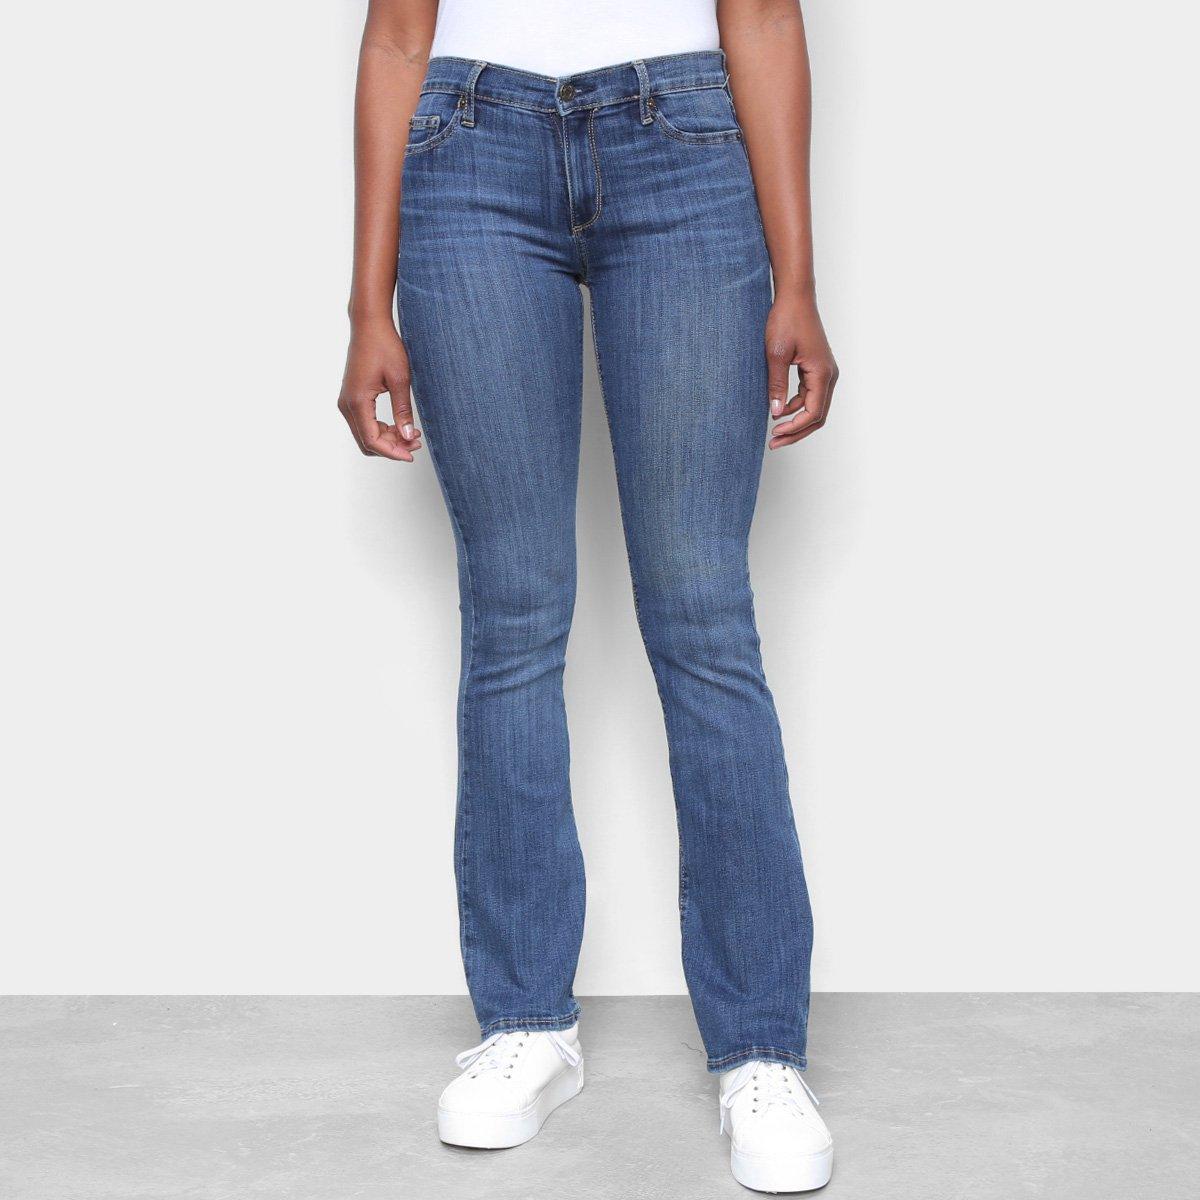 Calça Jeans GAP Fashion Curta Feminina